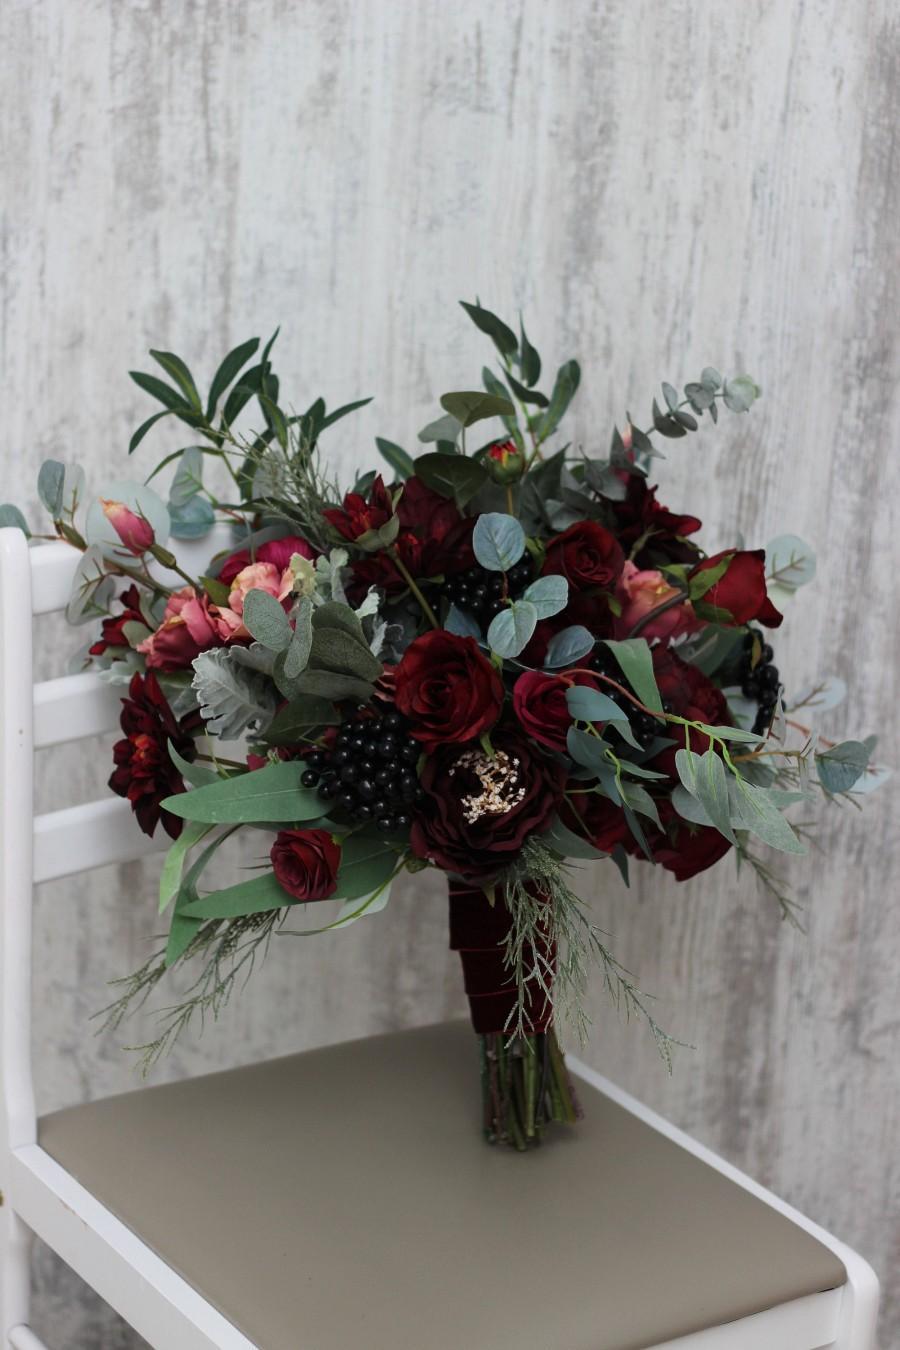 زفاف - Burgundy flowers Bridal bouquet Faux bouquet Fall wedding Peony eucalyptus Wedding flowers Silk flowers Boho wedding Outdoor  - size 18 inch